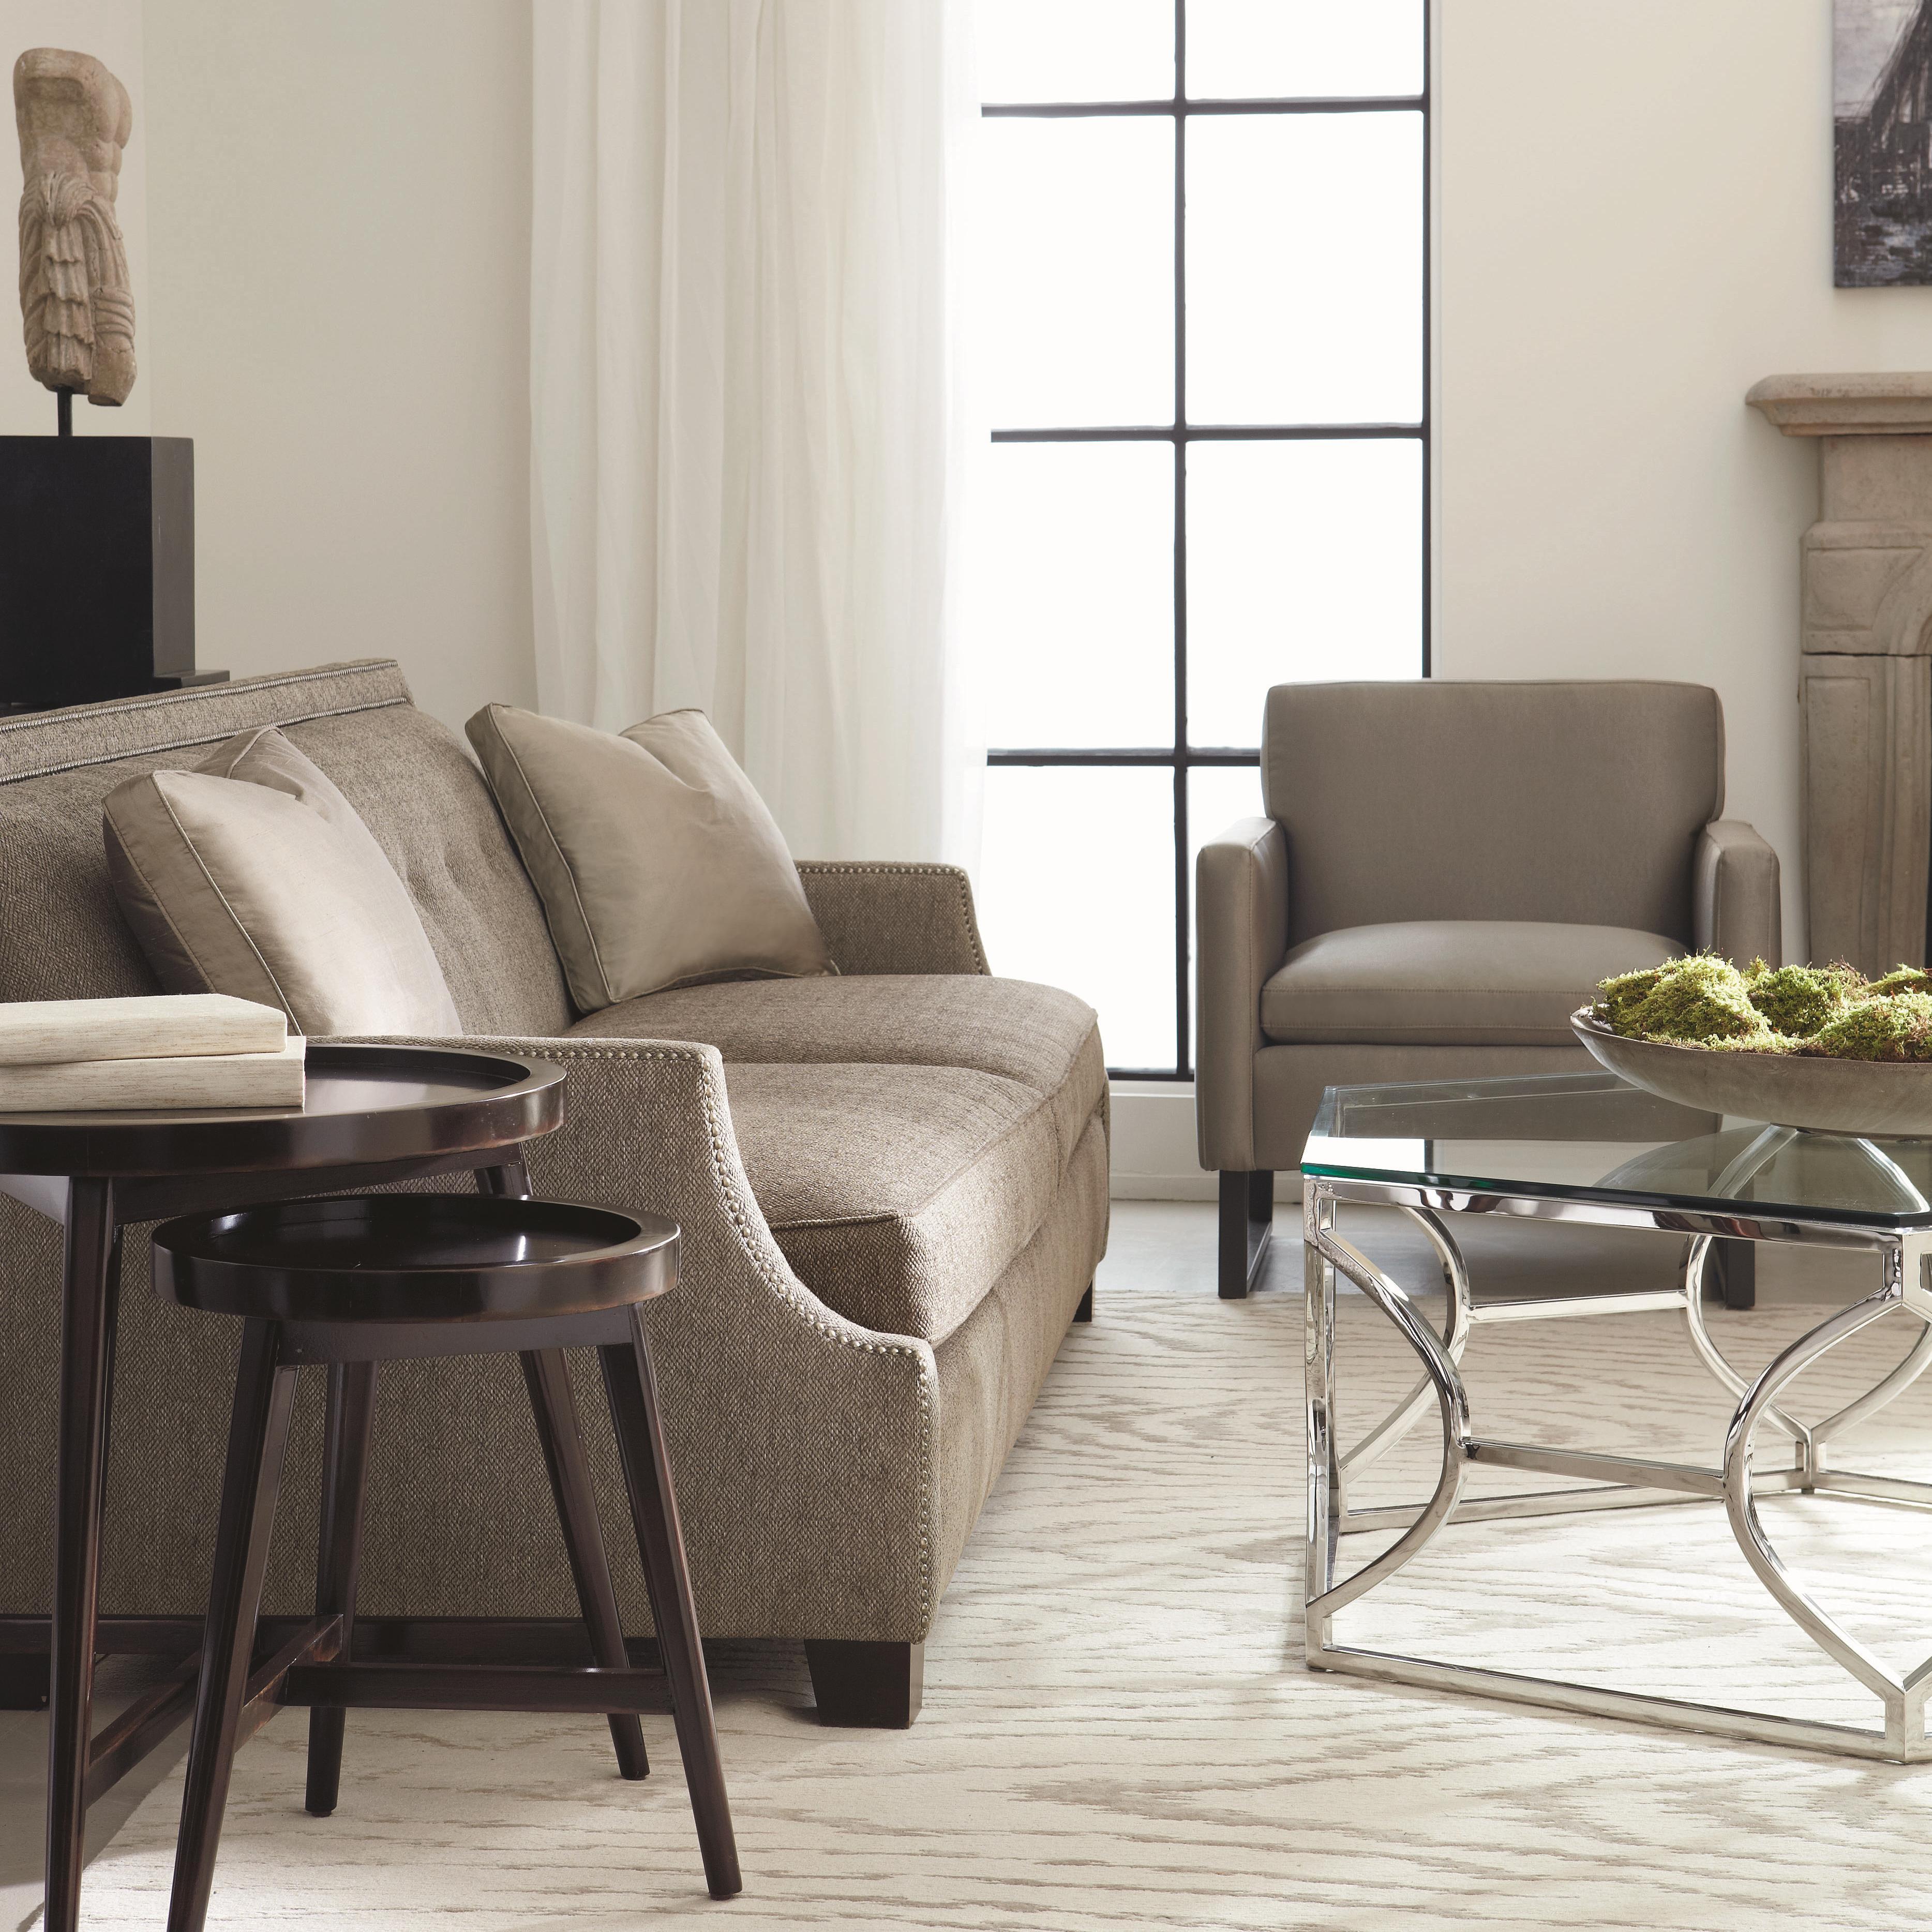 Bernhardt Interiors - Franco High End Transitional Sofa ...